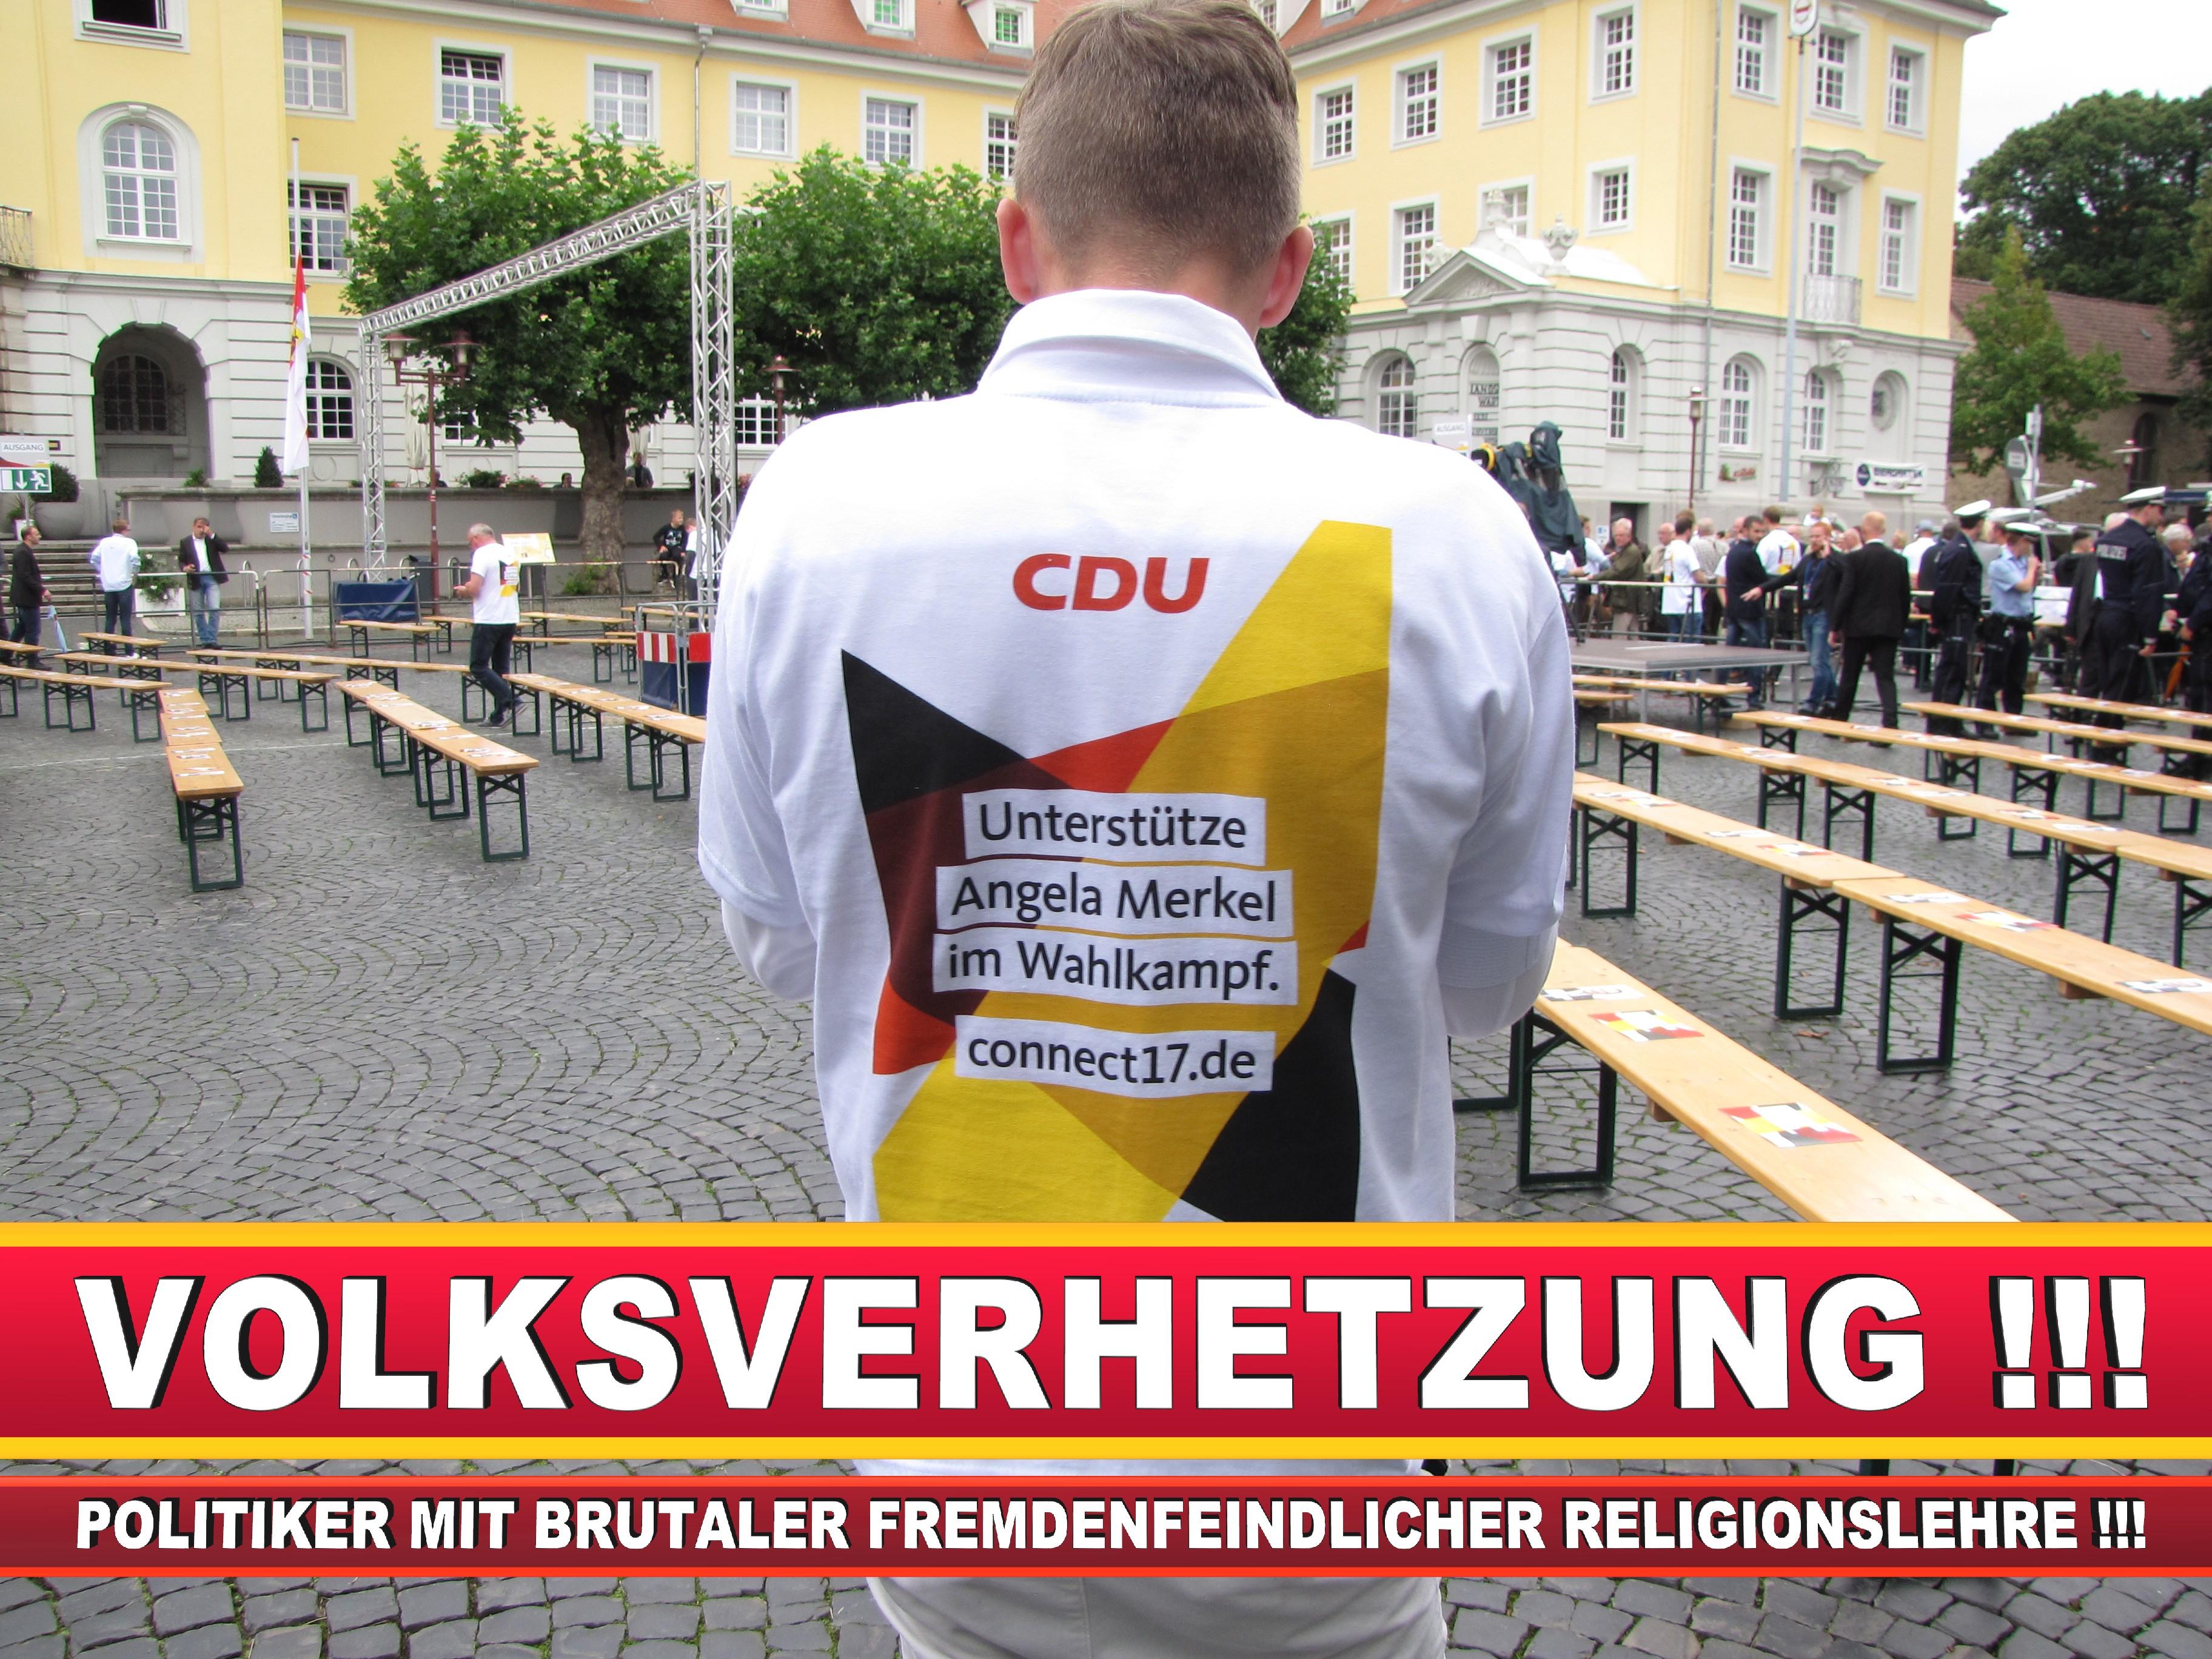 CDU HERFORD Kurruption Betrug Kinderpornografie Kinderpornos (19)